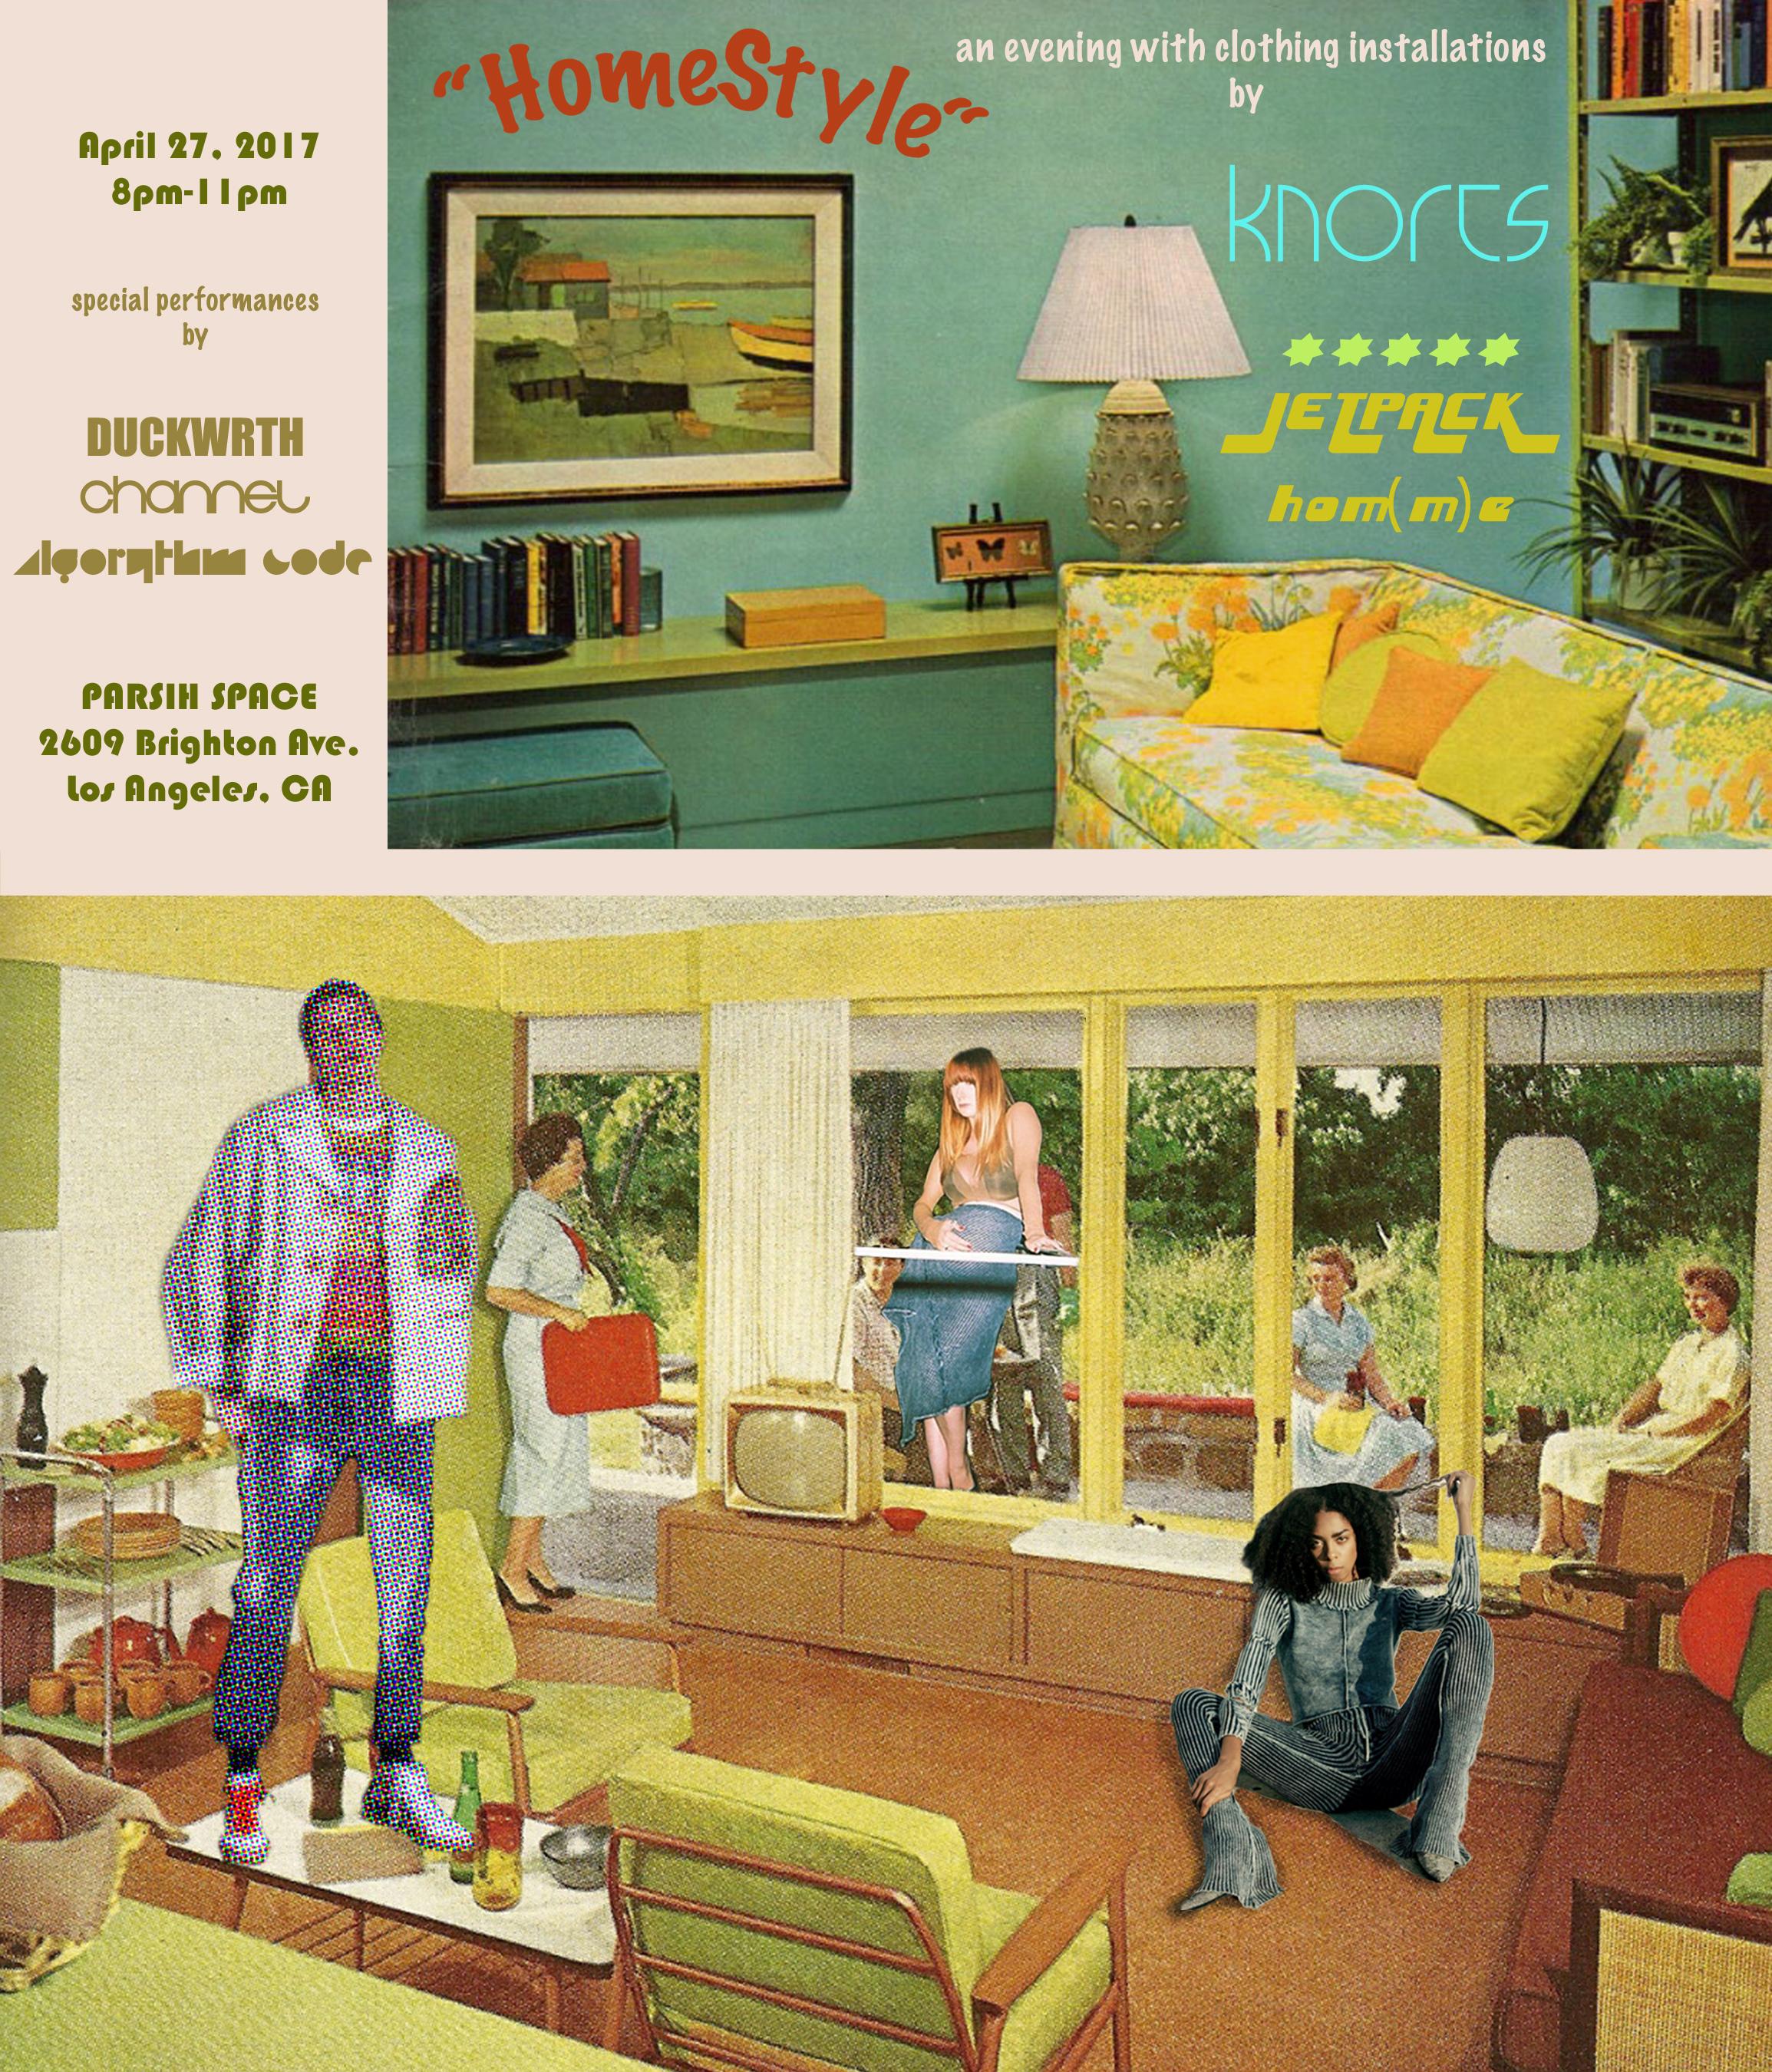 knorts jetpack flyer living room 1.jpg